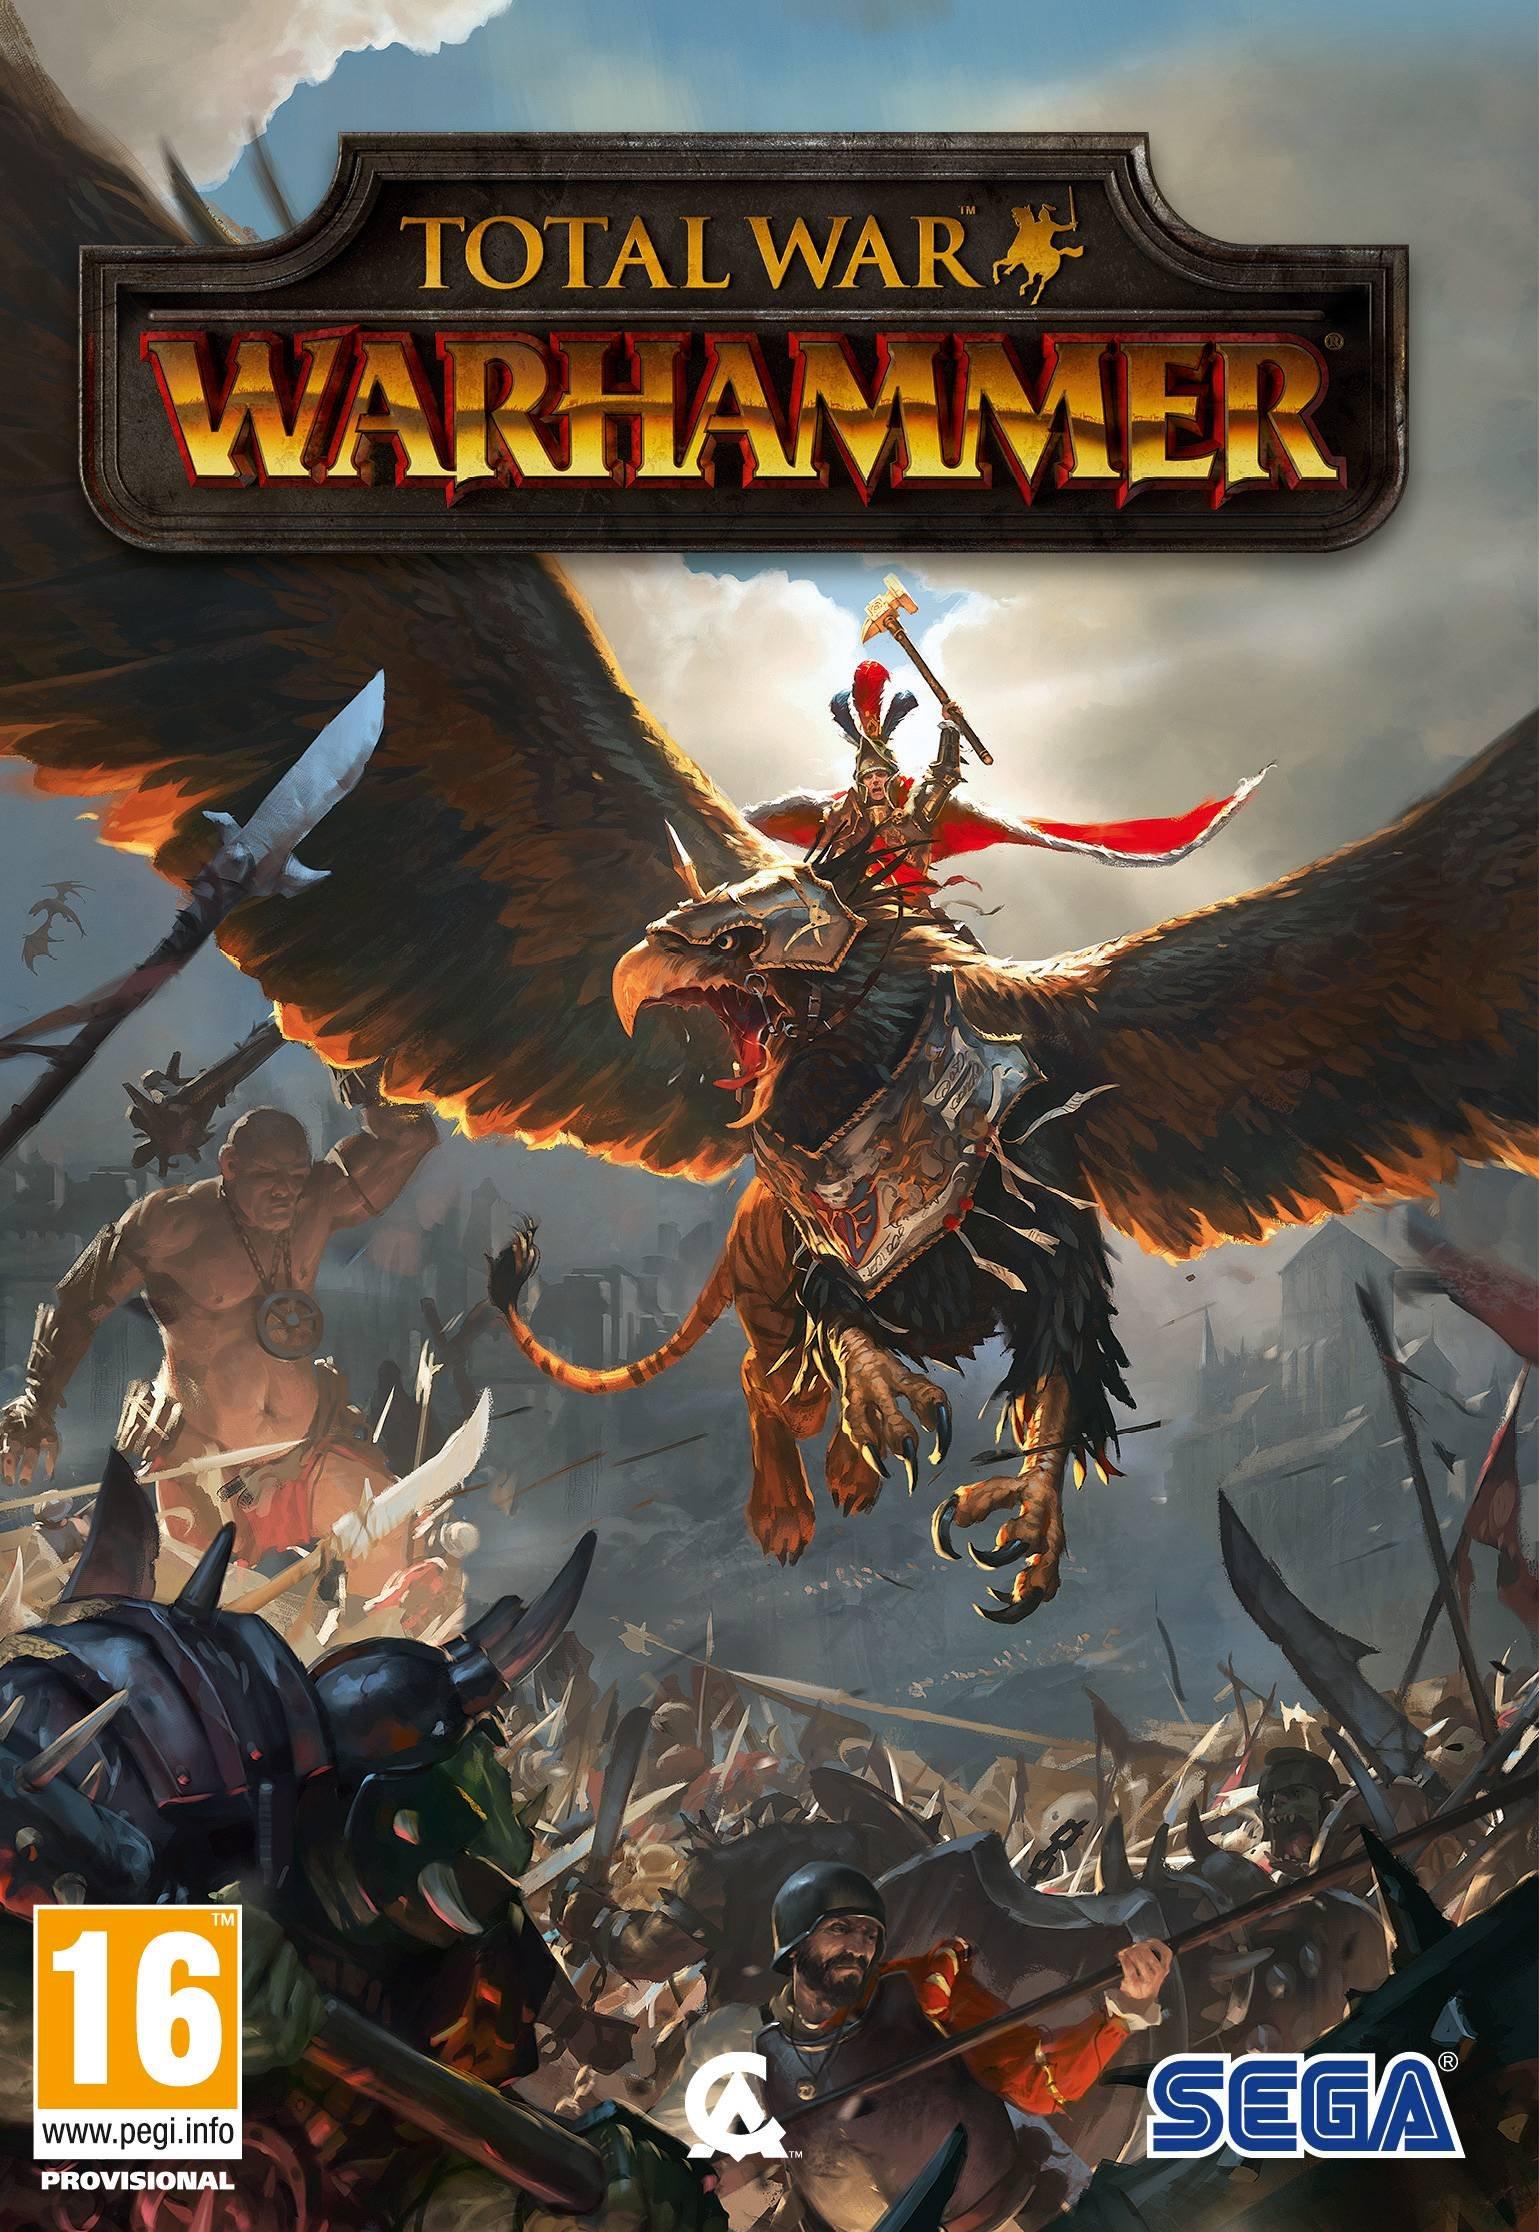 Total War: WARHAMMER (PC) Review 8